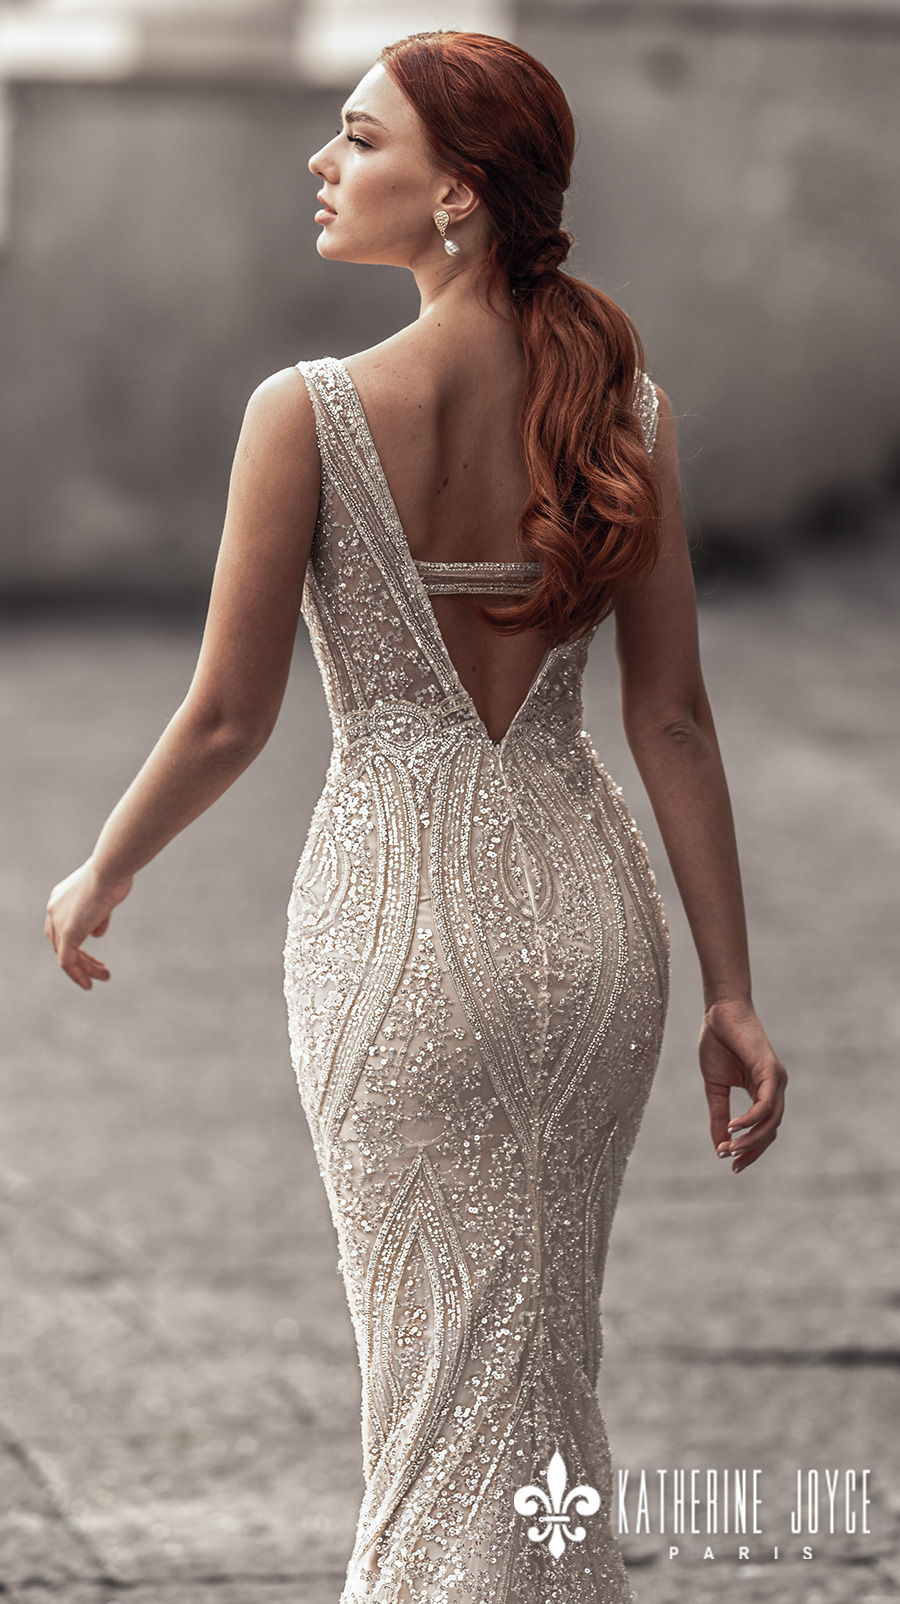 katherine joyce 2021 naples bridal sleeveless deep v neck full embellishment glitter glamorous elegant gold sheath wedding dress v back sweep train (sirena) bv